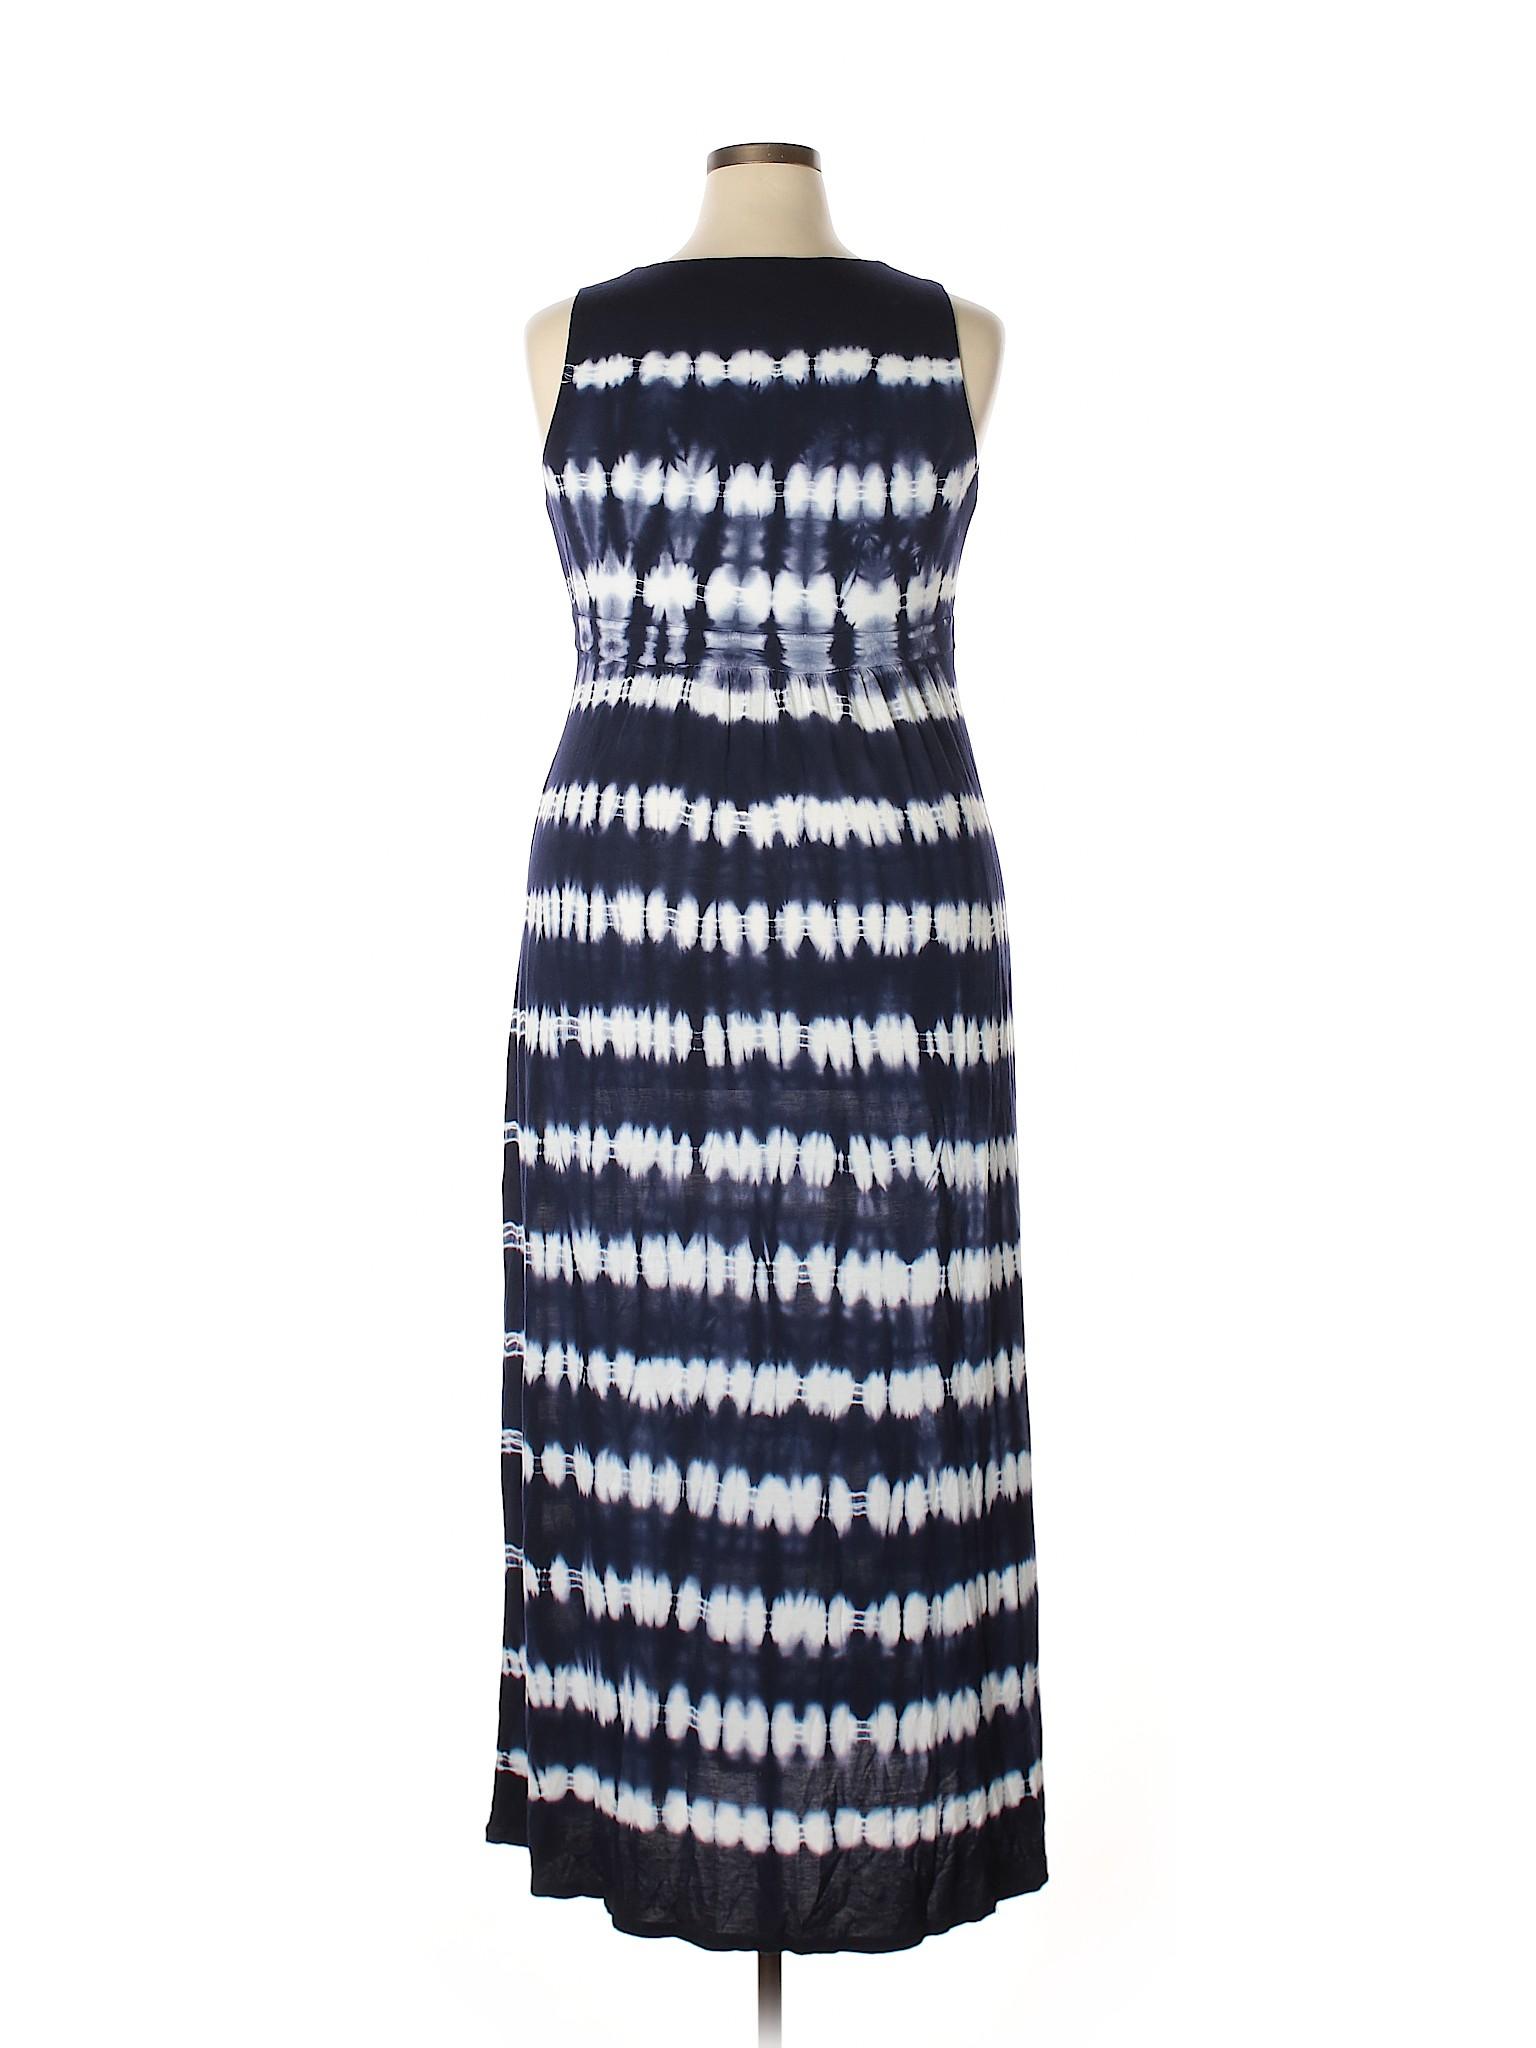 winter Dress Casual Boutique INC Concepts International AFqw7B